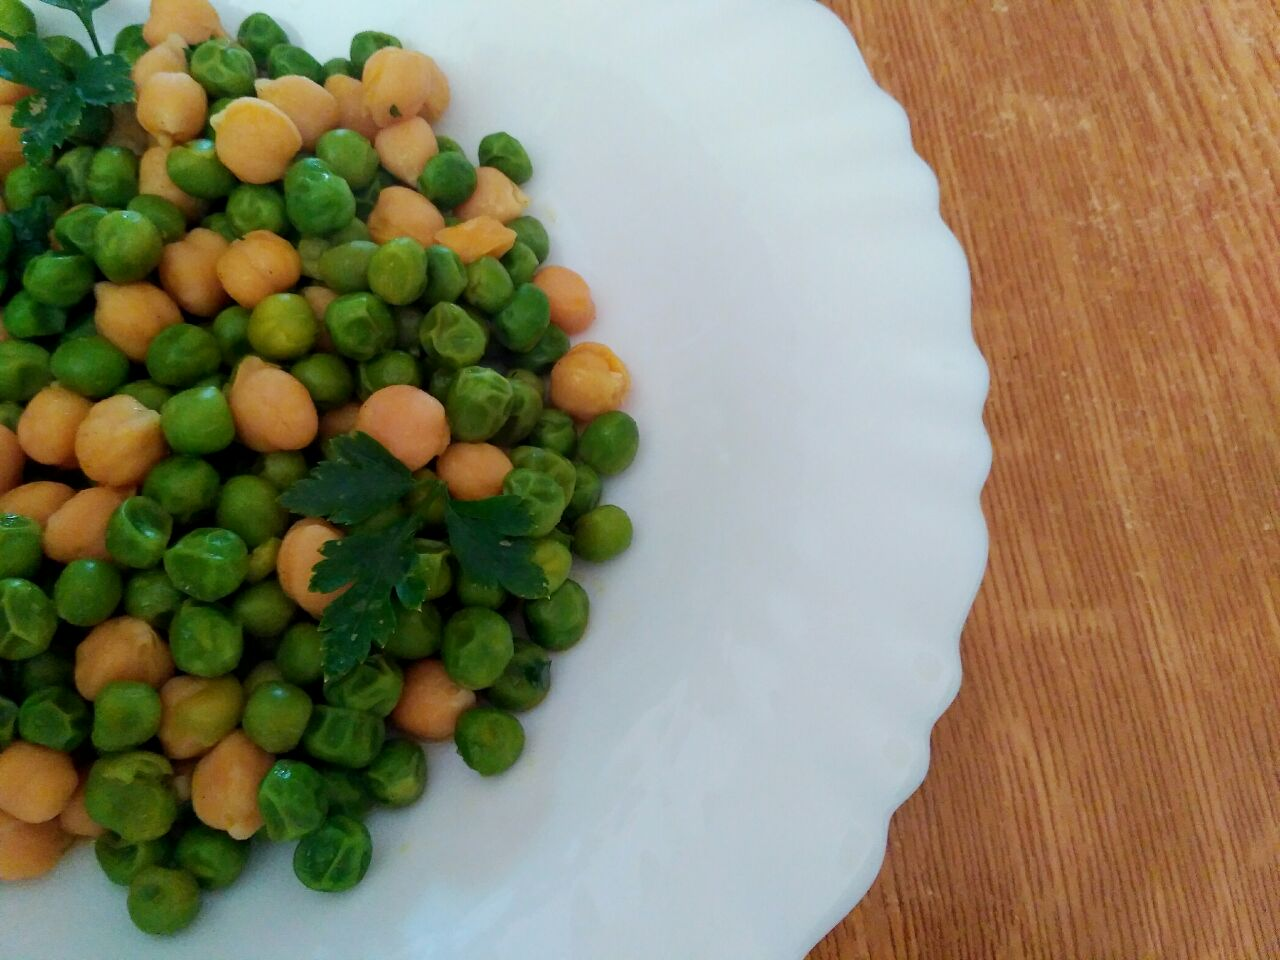 Ricette vegetariane: insalata di ceci e piselli verdi!